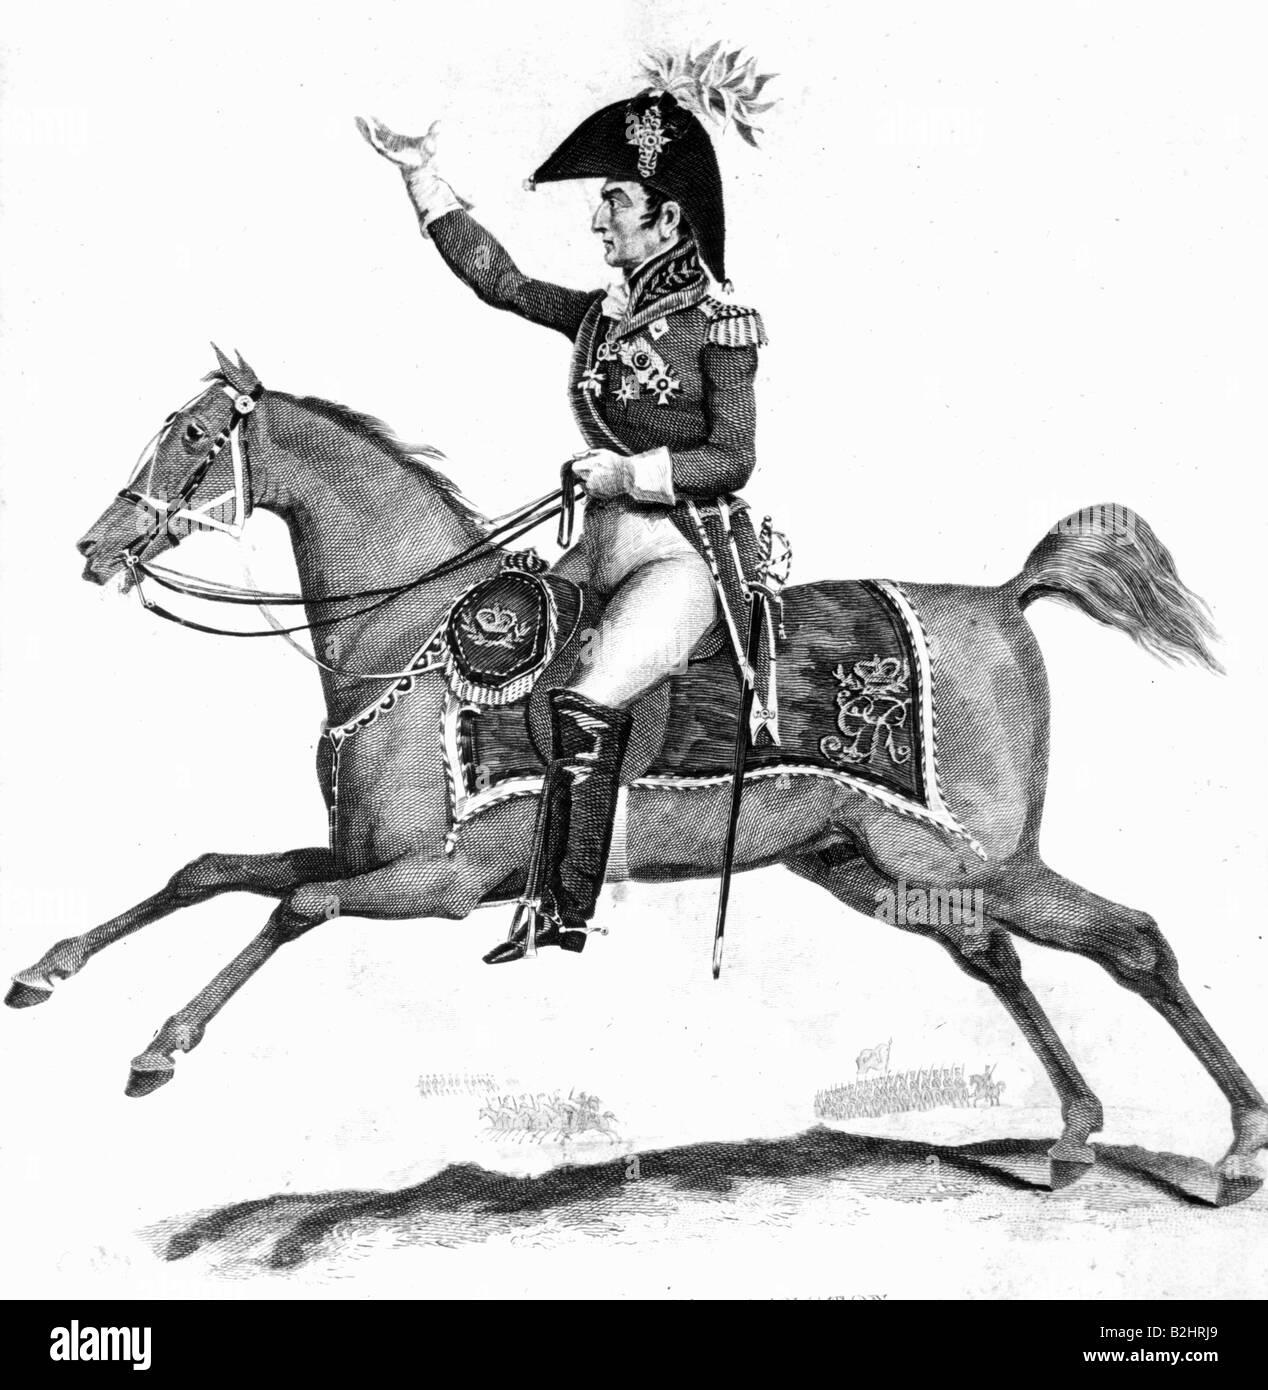 Wellington, Arthur Wellesley Duke of, 1.5.1769 - 14.9.1852, British General and politician, equestrian half length, - Stock Image